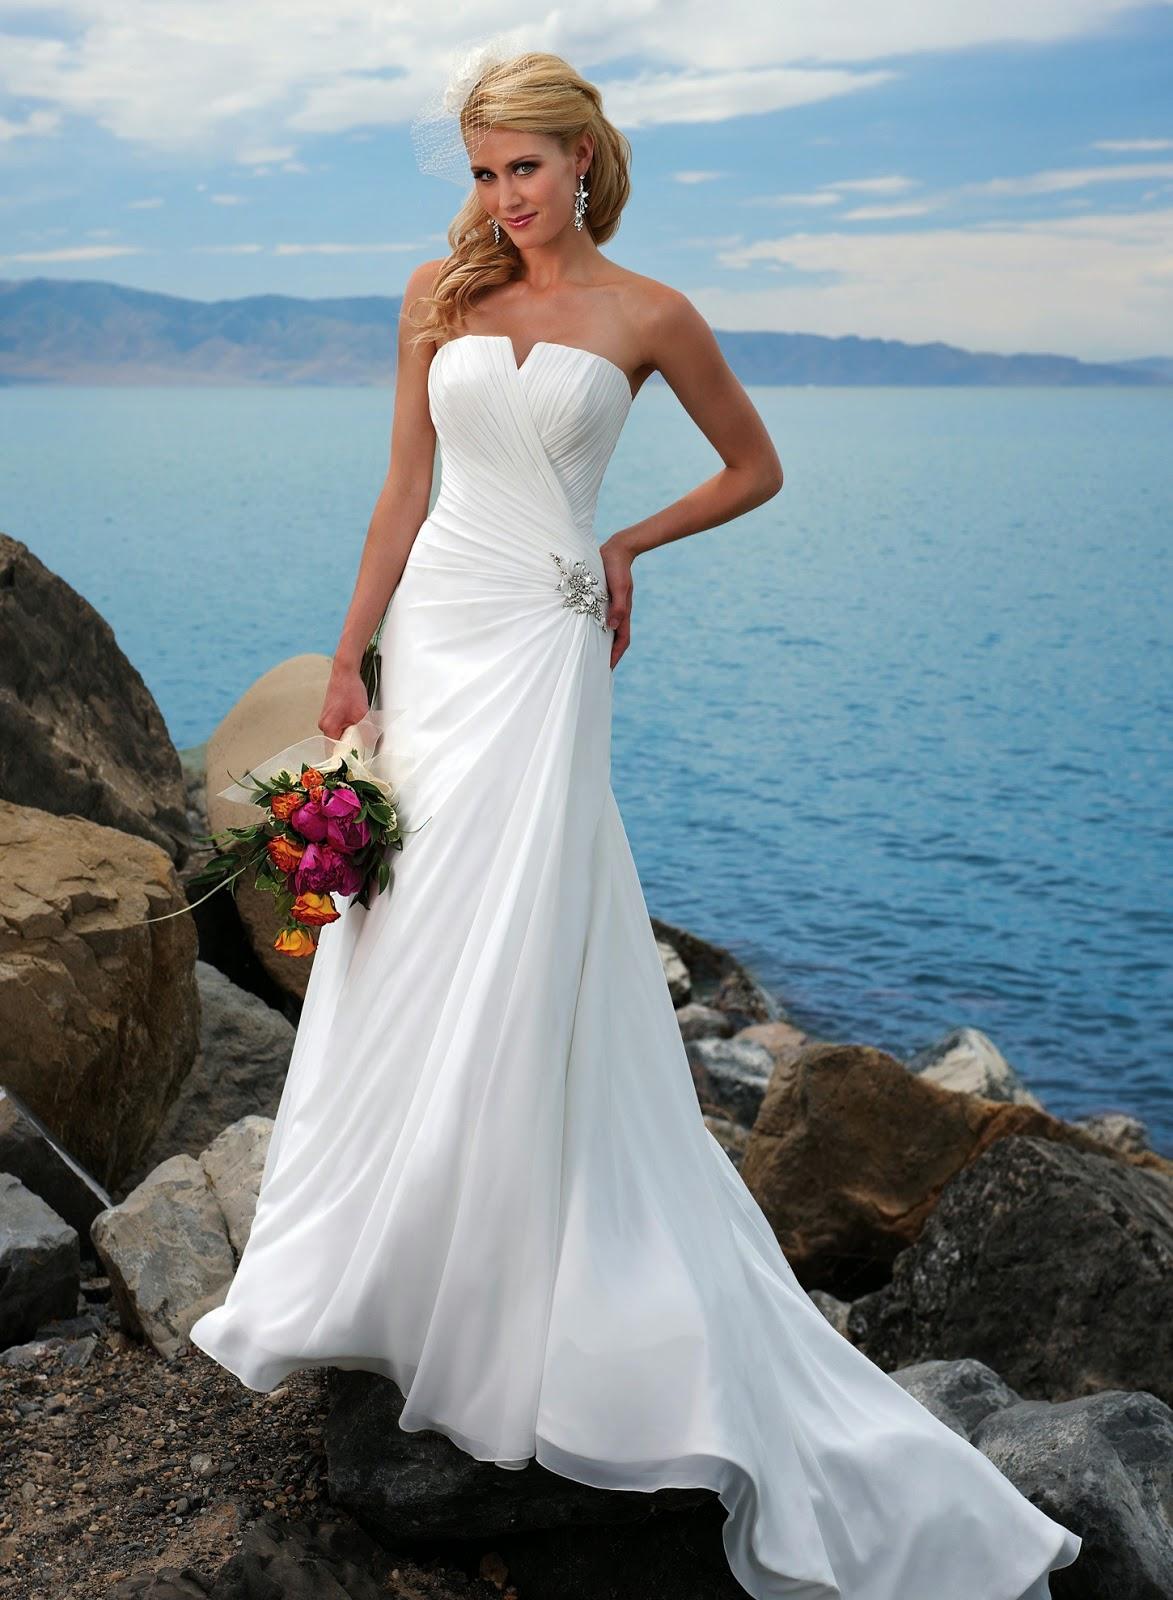 Beach Wedding Dresses 2015 Wedding Dresses Cold Climates